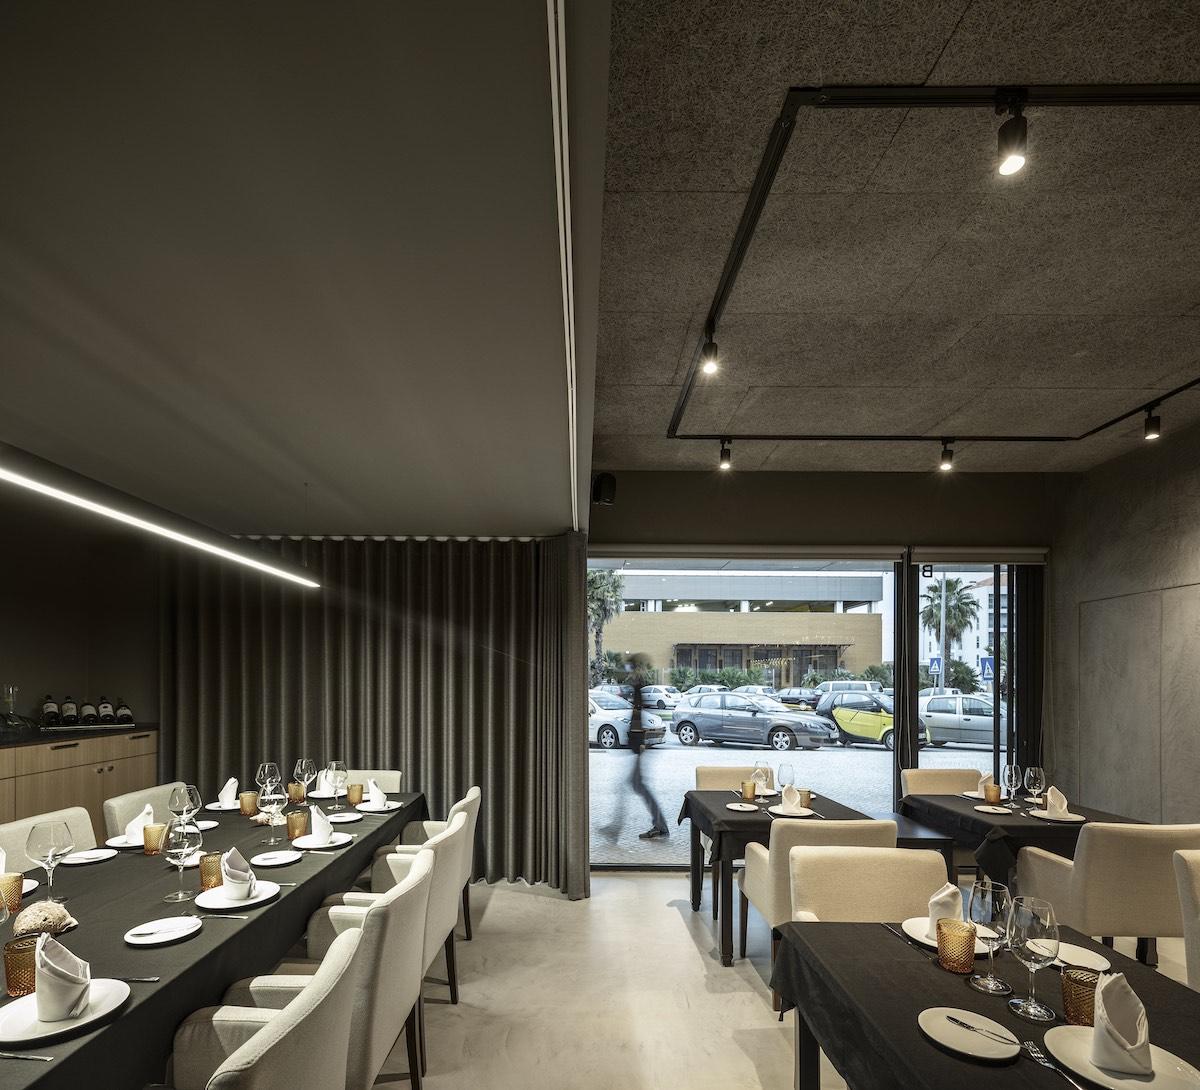 FAMA_Restaurant_Paulo_Martins_Arquitectura_and_design_AmazingArchitecture_%20003.jpg